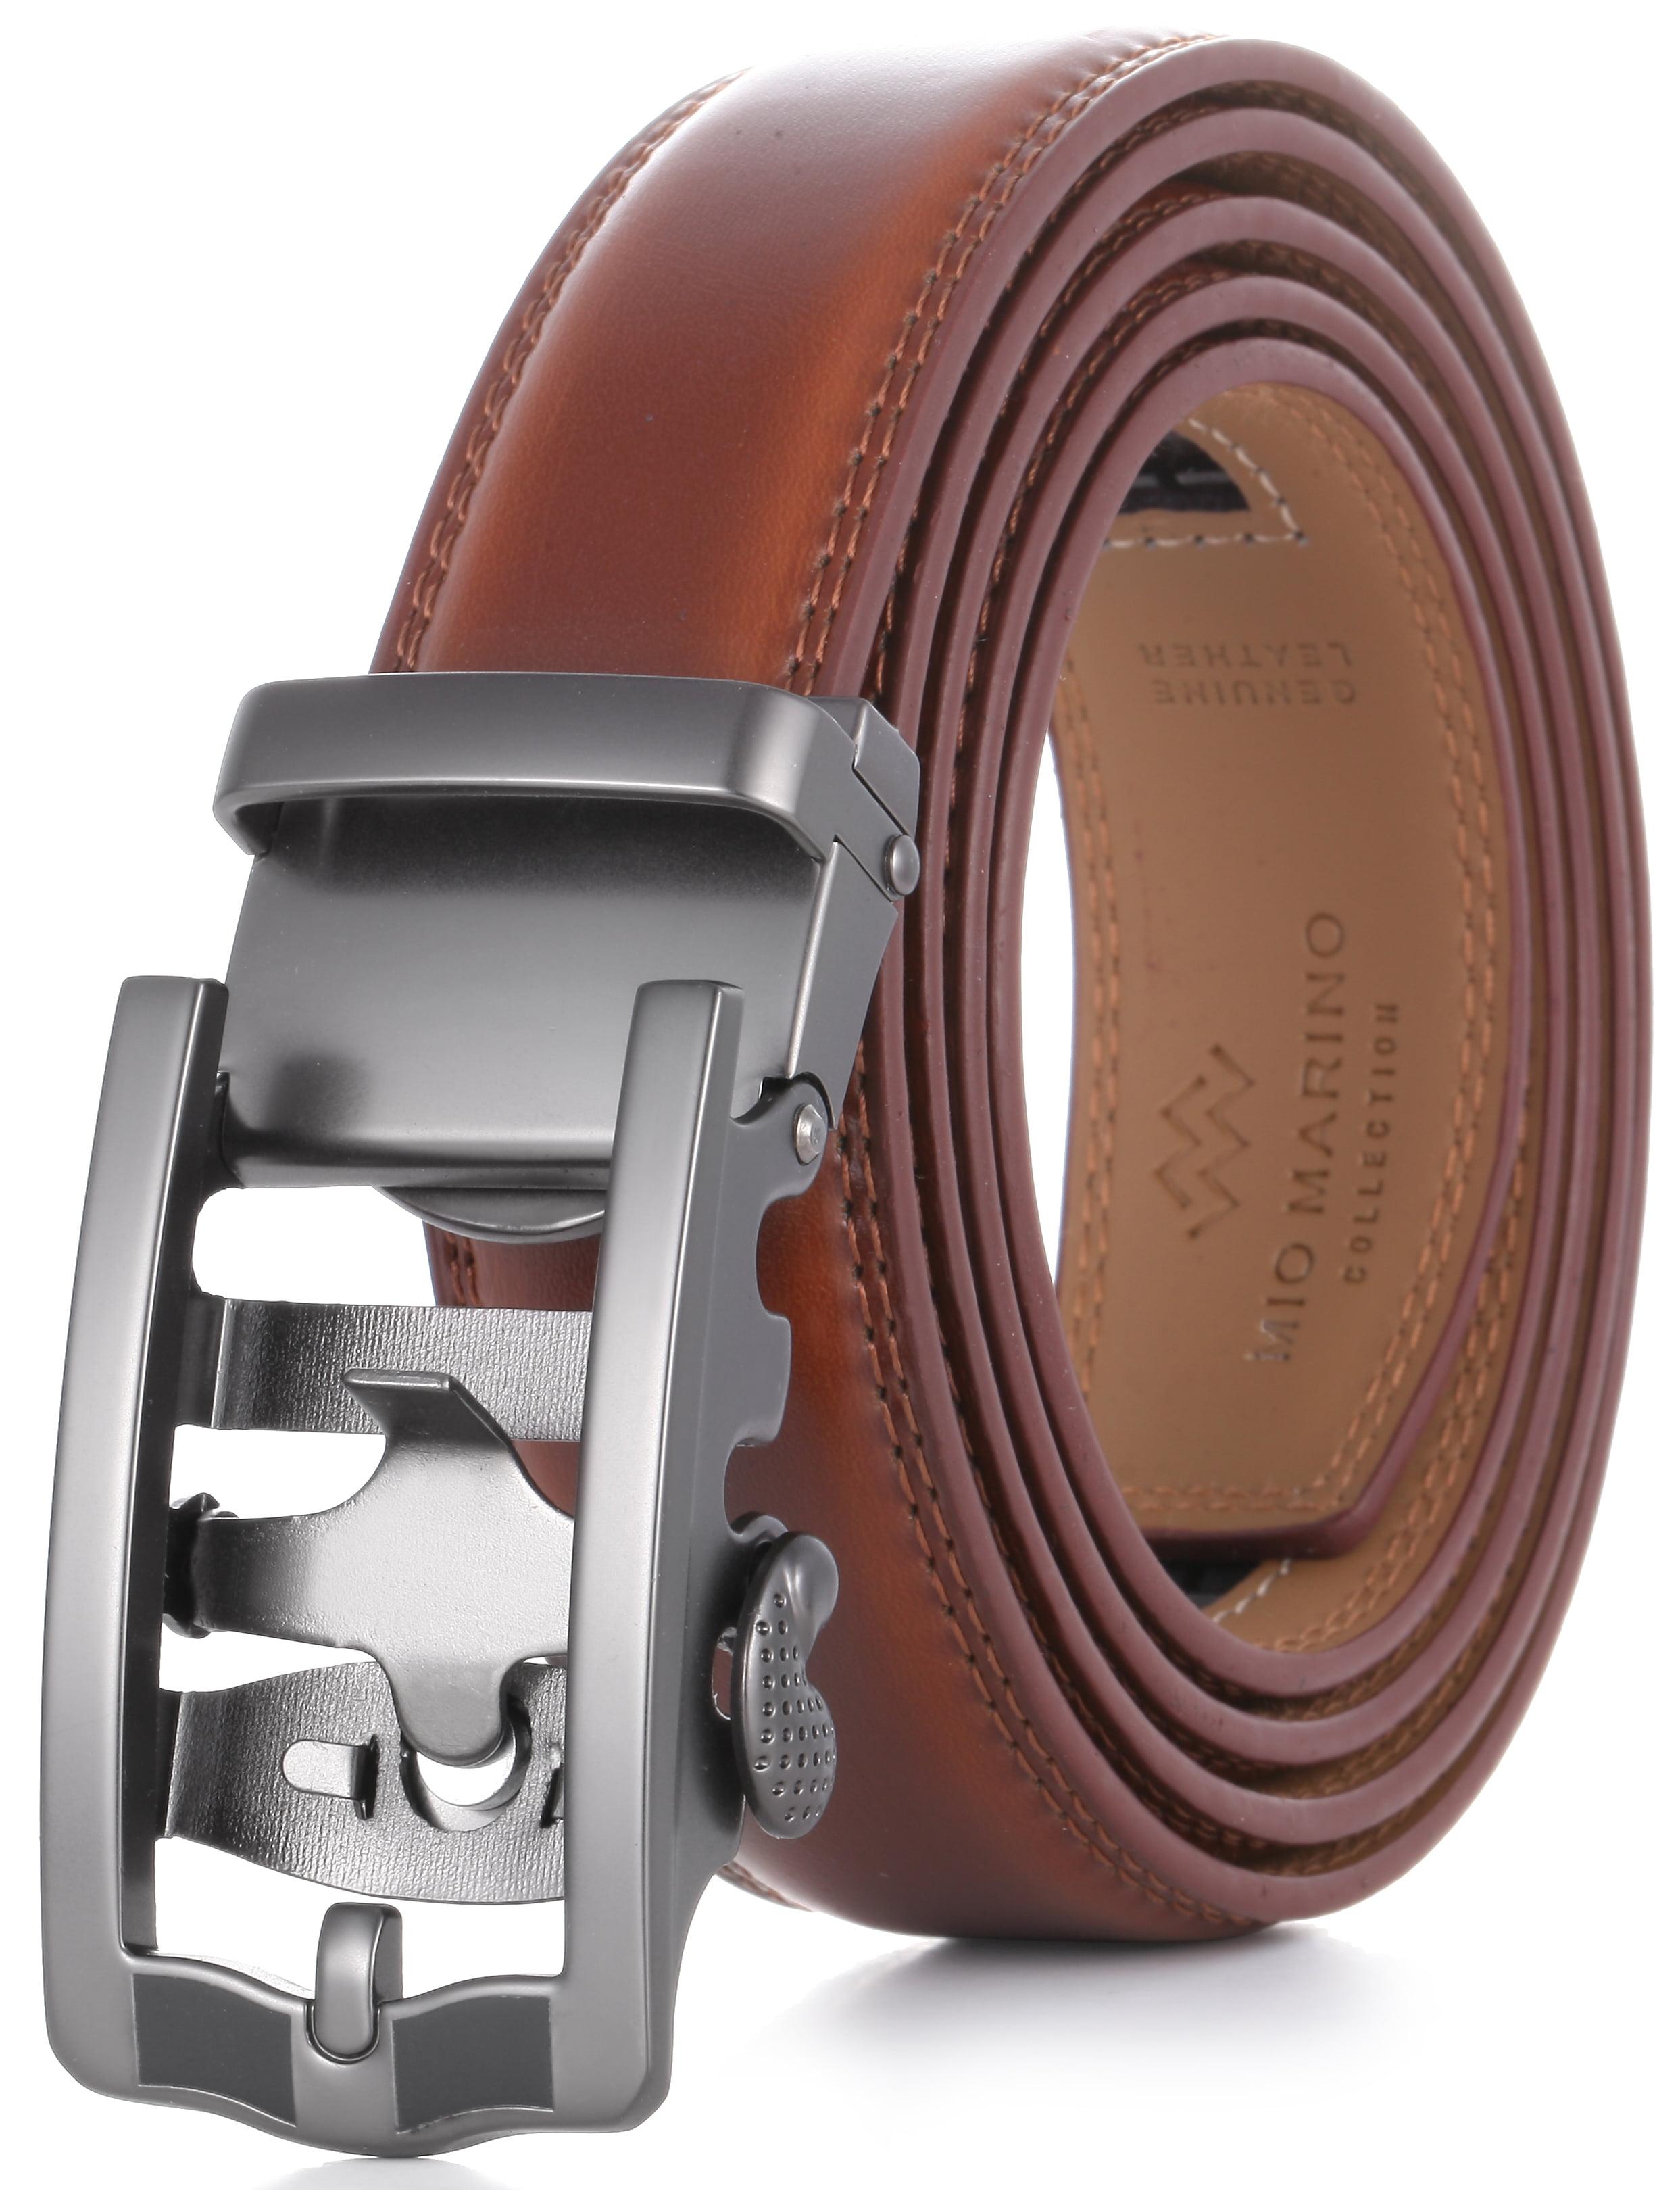 Mio Marino Classic RatchetBelt Premium Leather 1.38 Wide Adjustable Buckle Fre